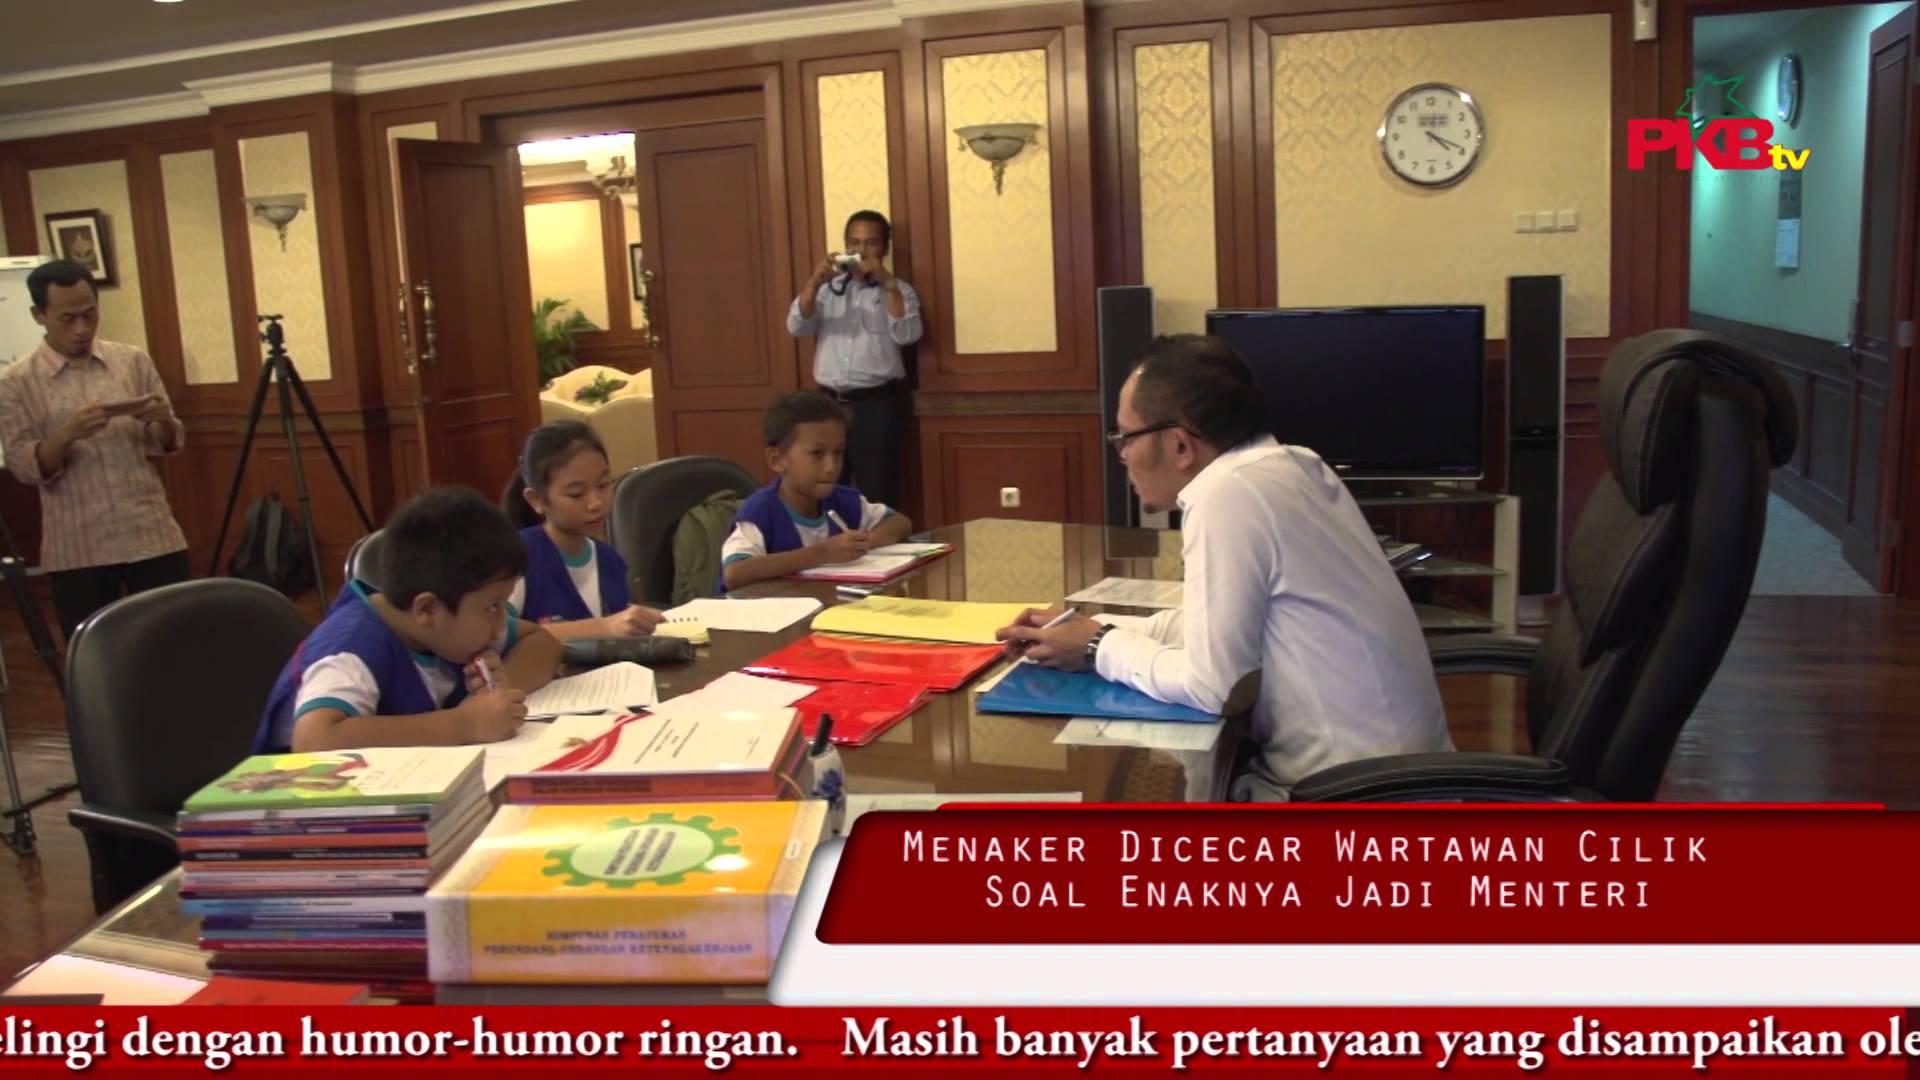 Menaker Dicecar Wartawan Cilik Soal Enaknya Jadi Menteri